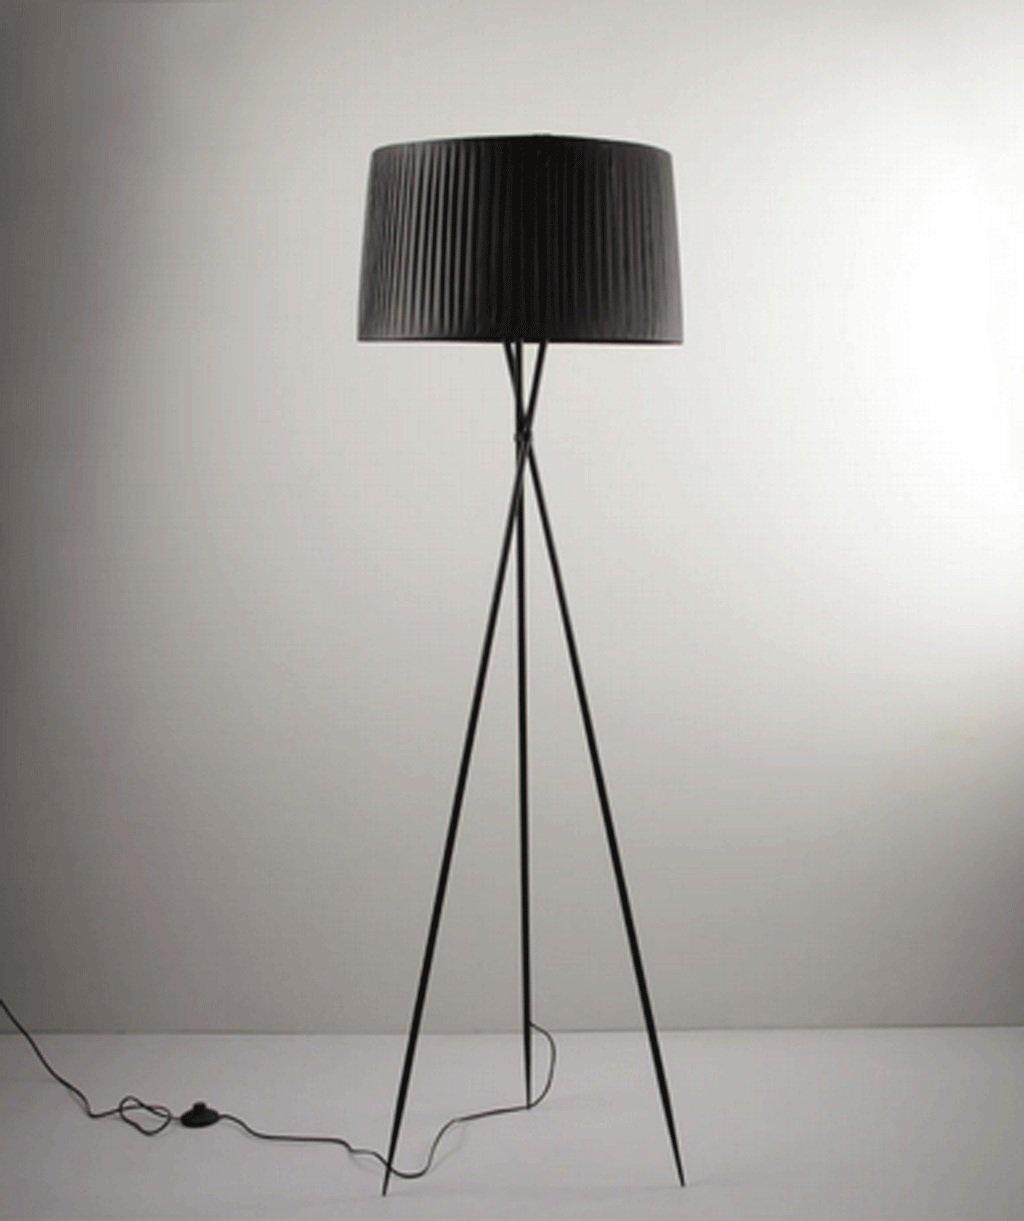 JCRNJSB® シンプルでモダンなアートベッドサイドリビングルームシンプルなフロアランプクリエイティブファブリックの三脚フロアランプ(光源なし) 照らすために調光可能 ( 色 : #1 ) B07CBQCBP4 23533 #1 #1